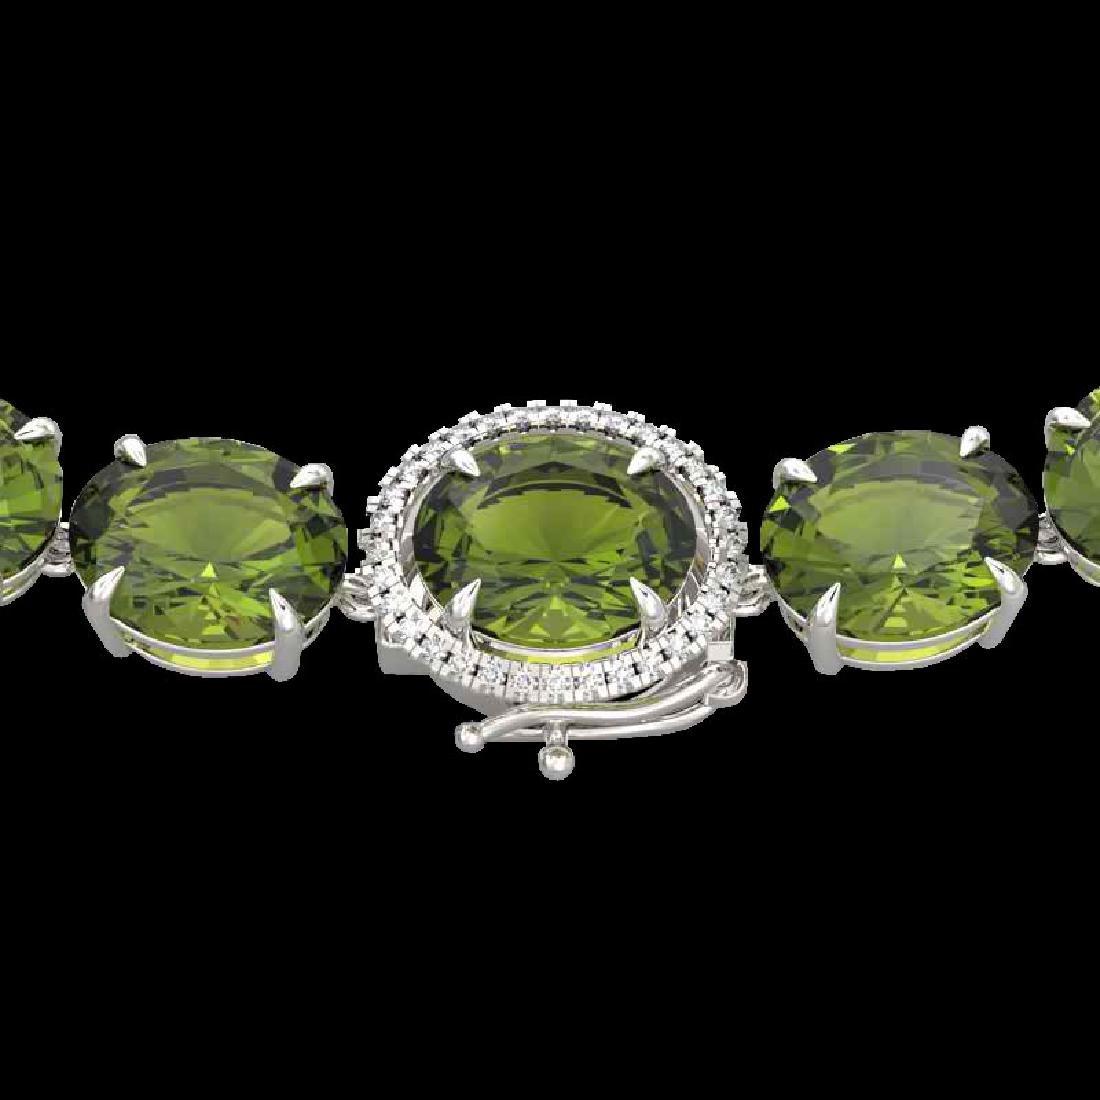 145 CTW Green Tourmaline & VS/SI Diamond Halo Micro